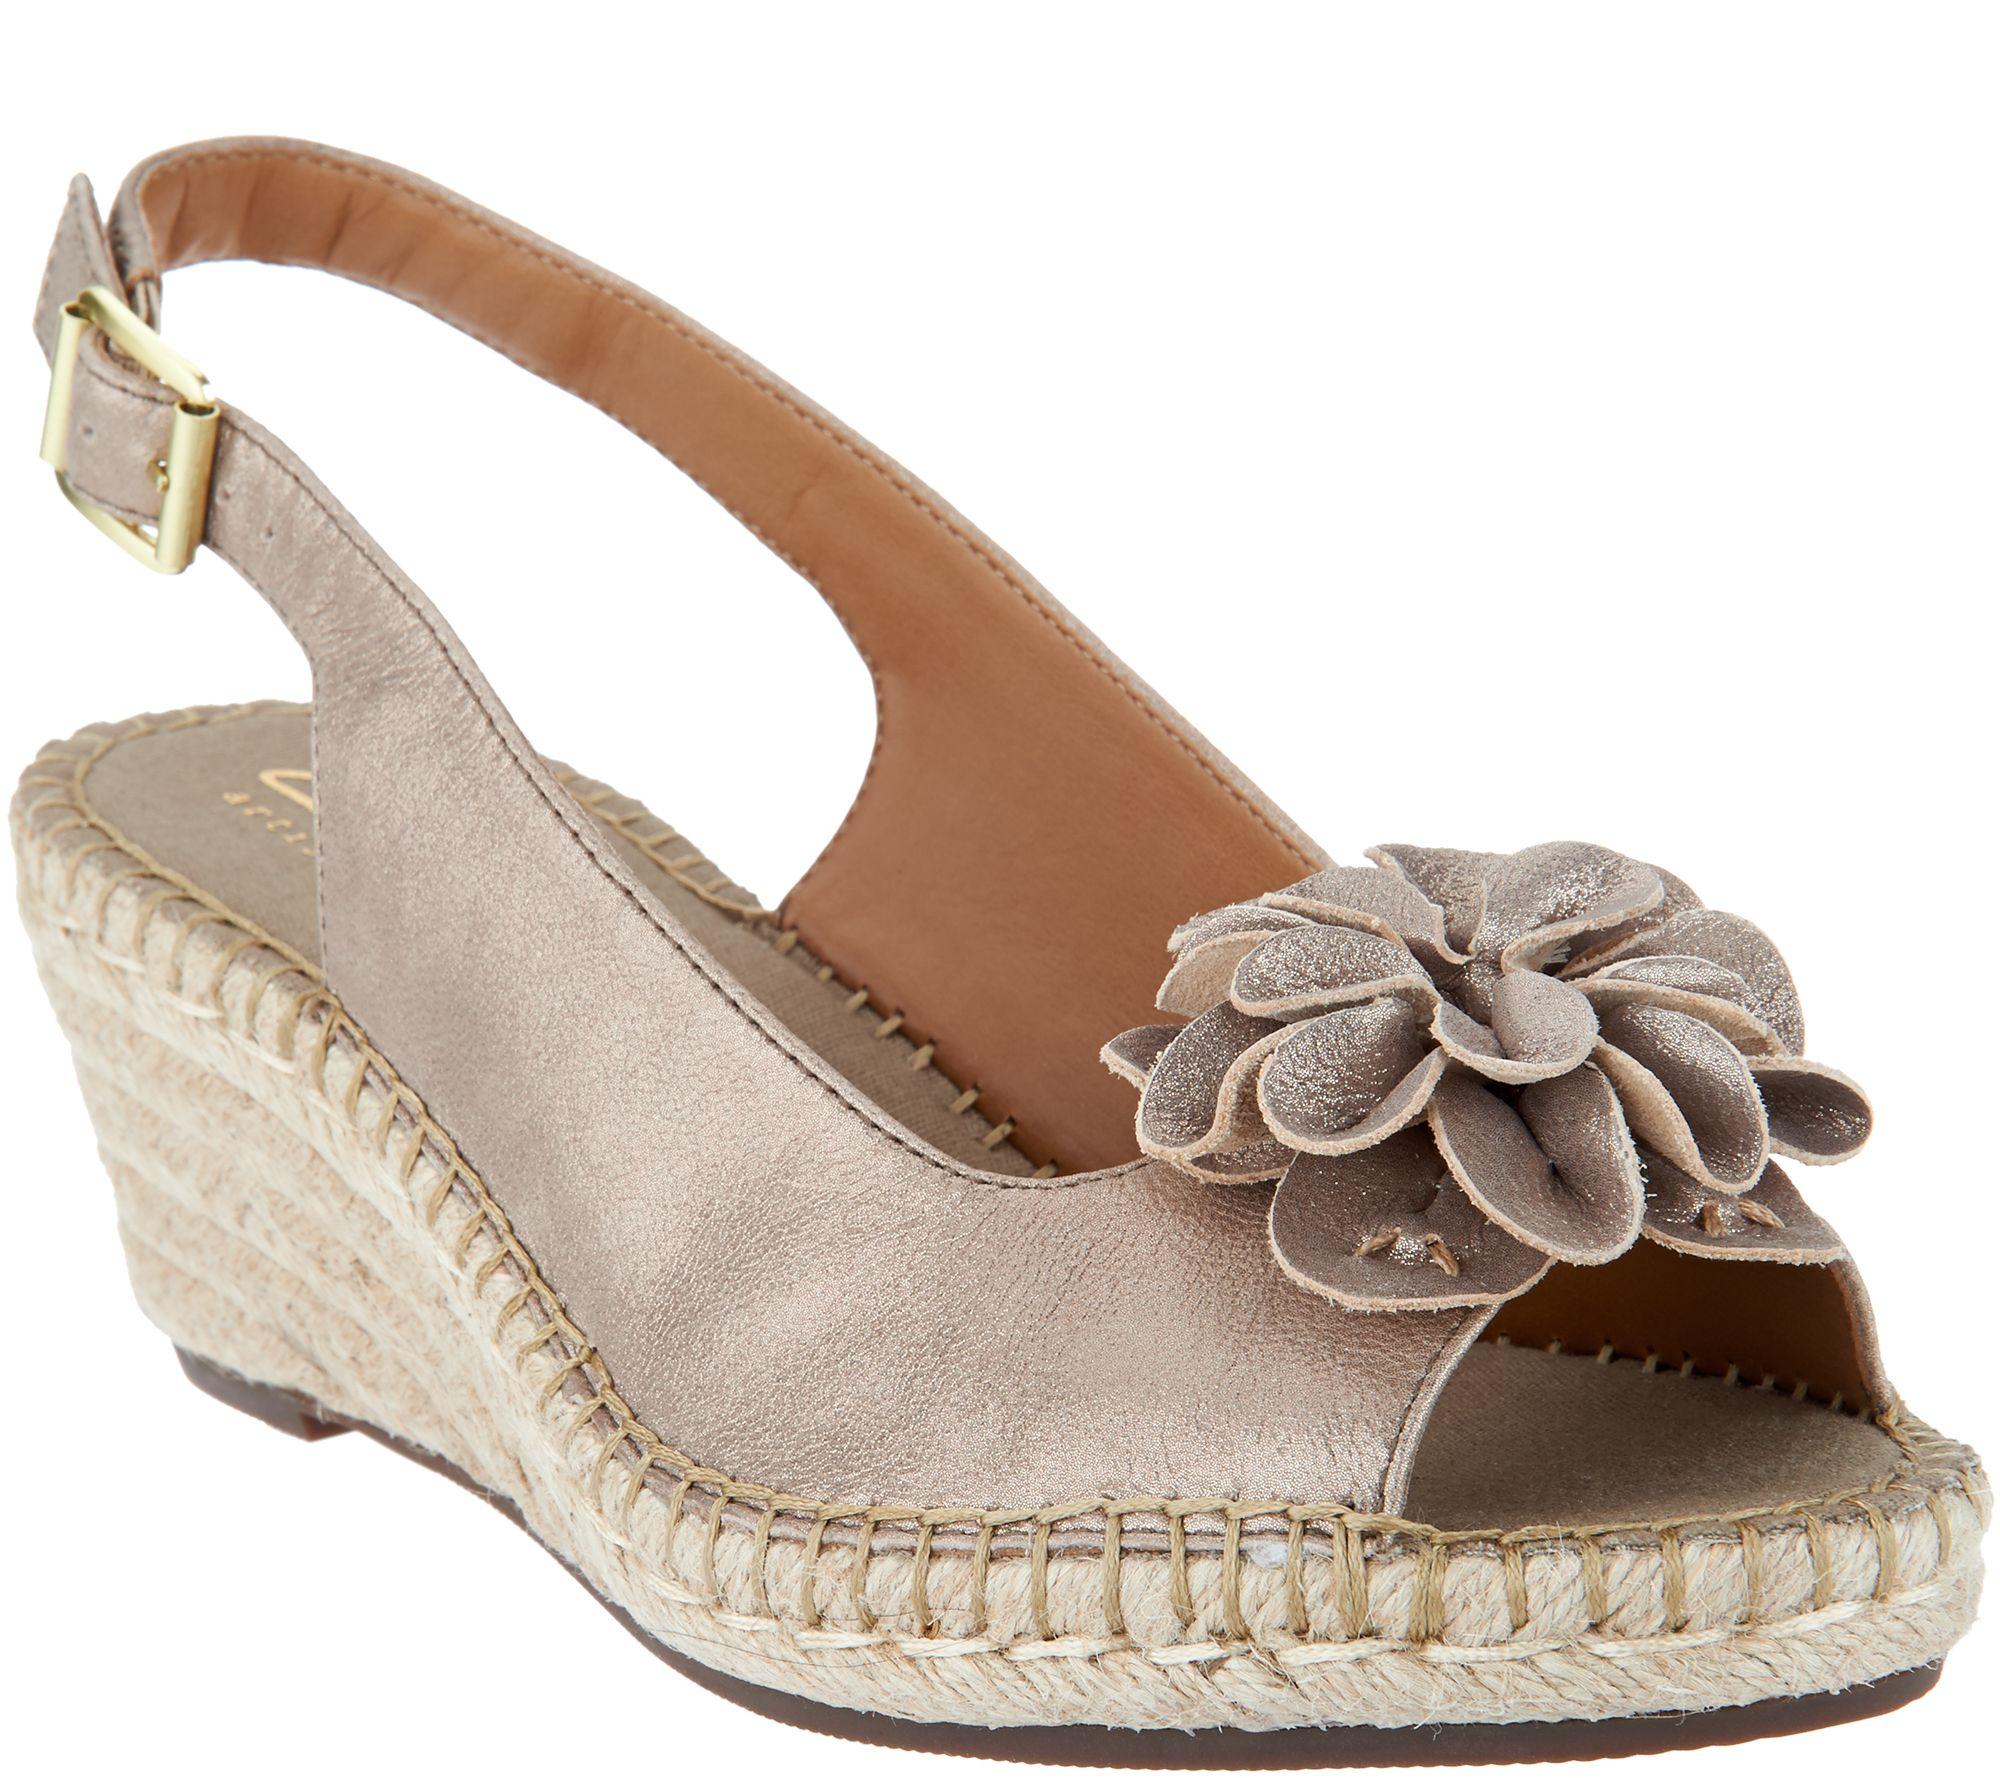 49d680e3309 Clarks Artisan Leather Peep-toe Espadrilles - Petrina Bianca — QVC.com